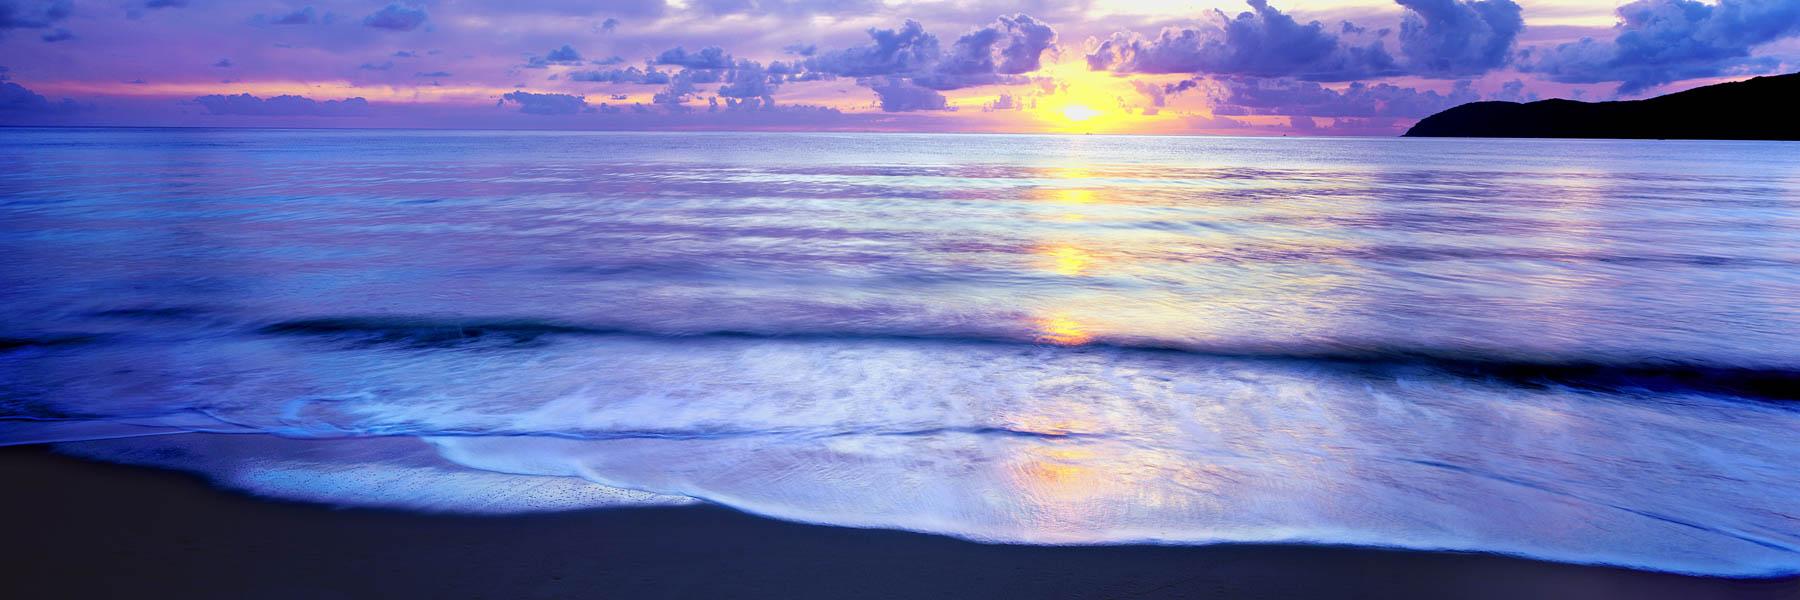 A glowing sunrise over Palm Island, north Qld, Australia.